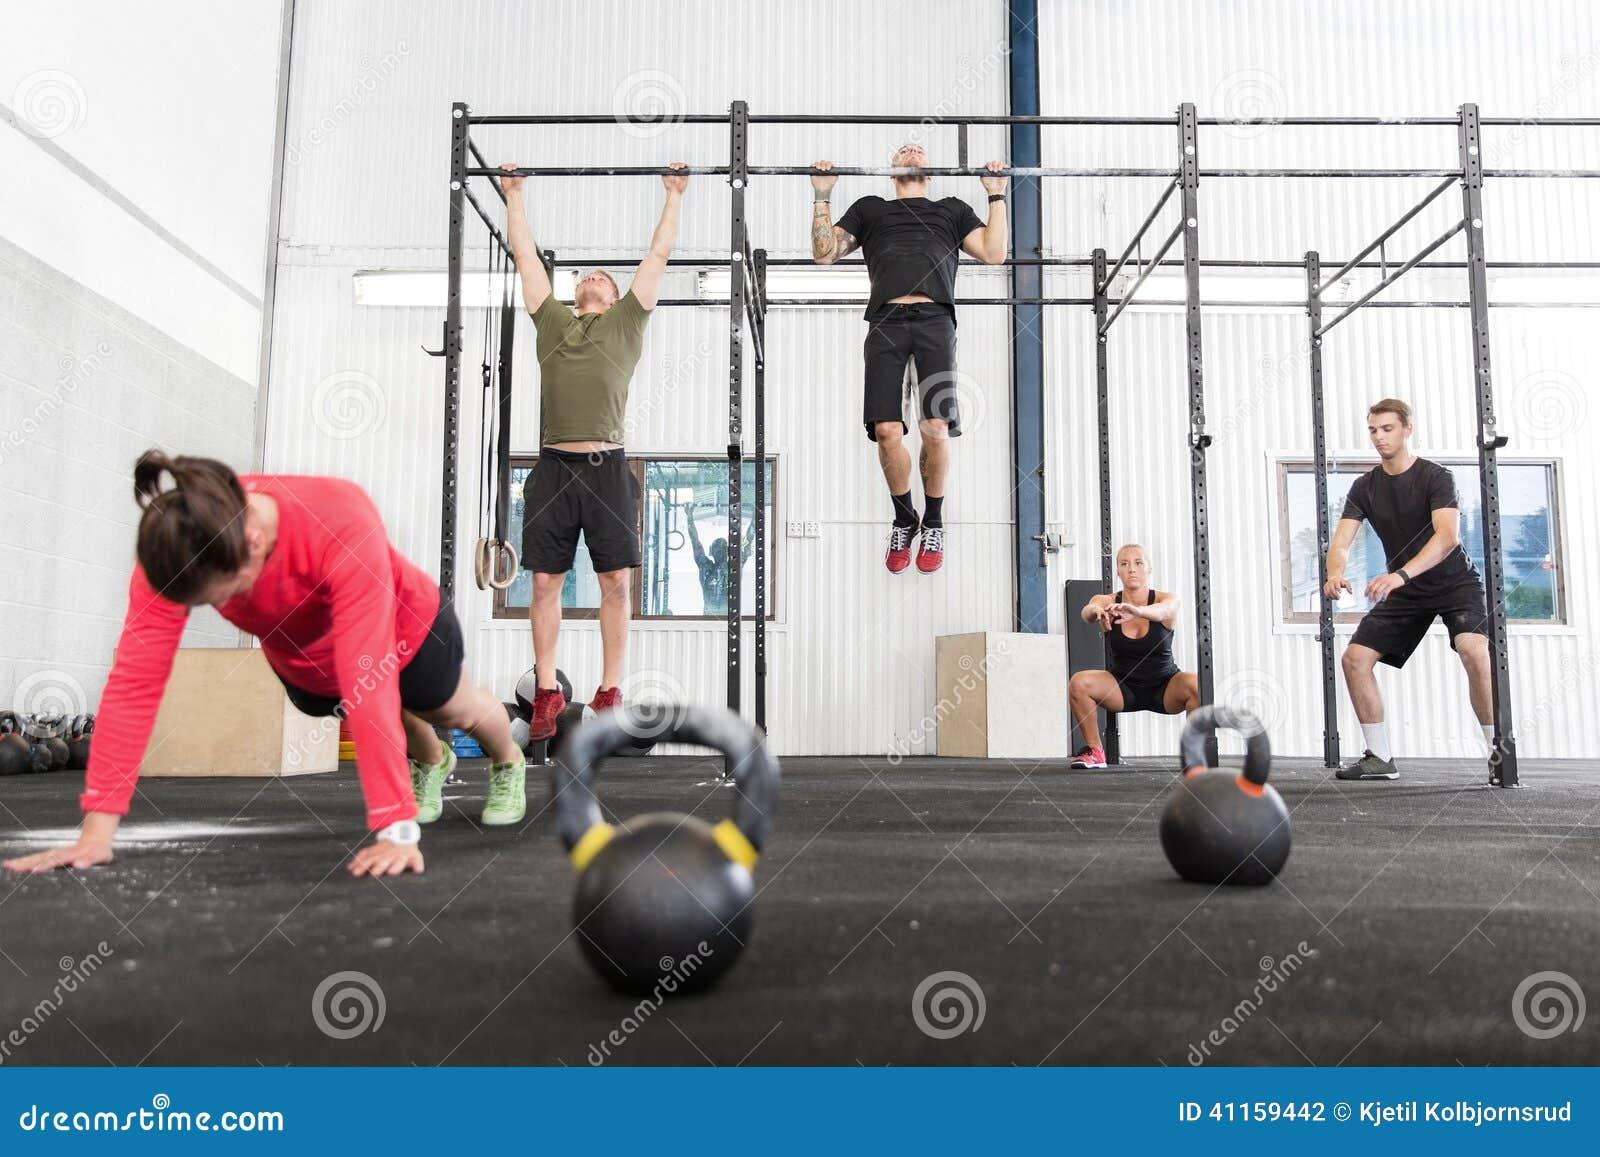 El grupo de Crossfit entrena a diversos ejercicios